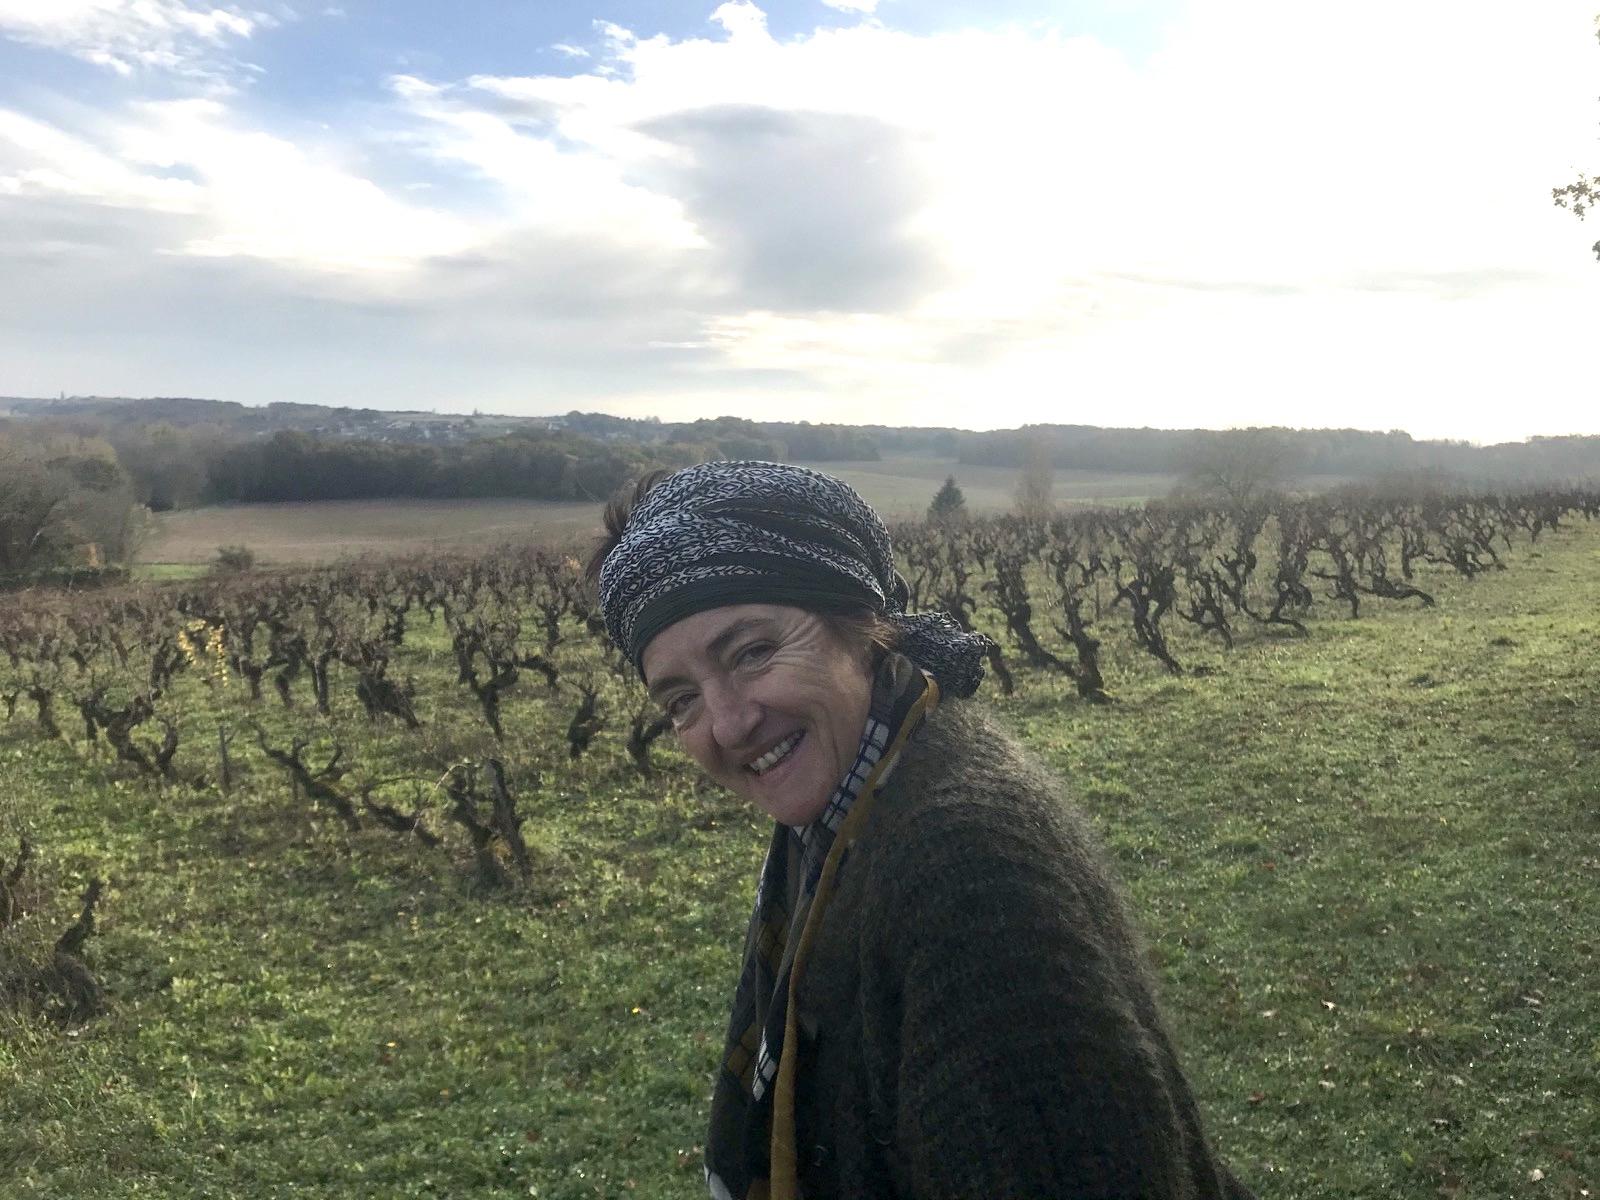 Filles de vignes, ép. 5 : La main amoureuse